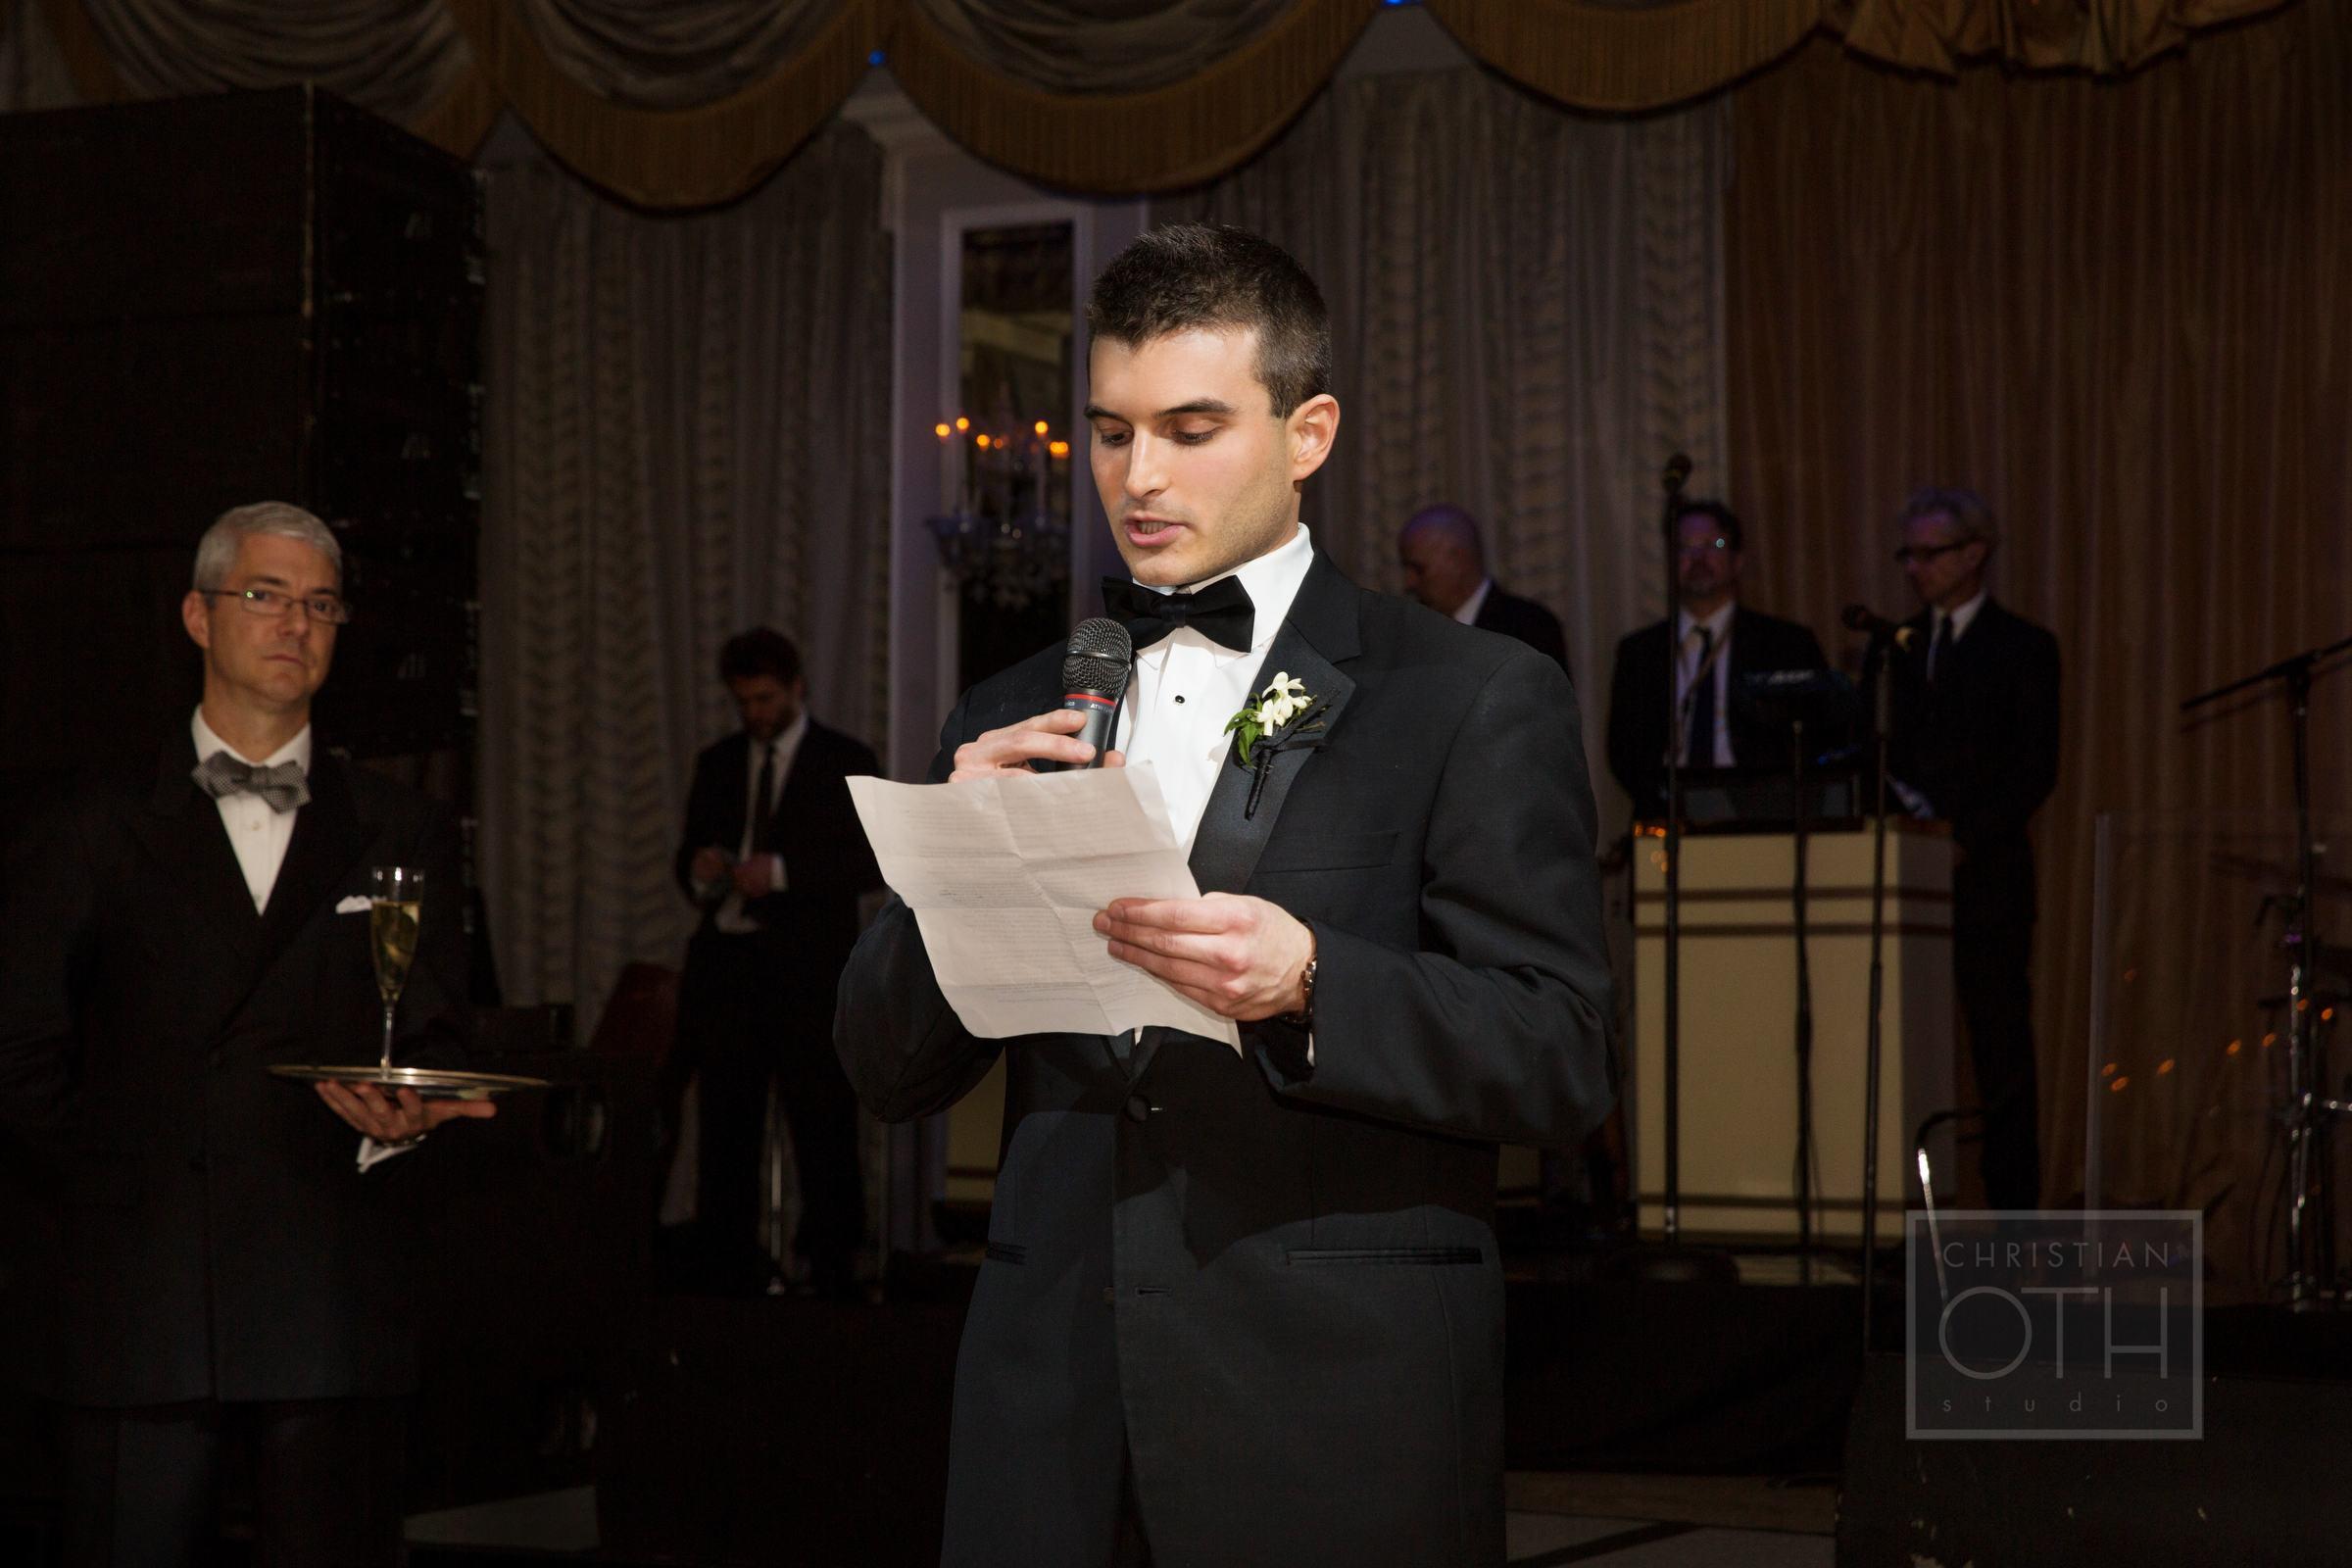 Ceci_New_York_Custom_Invitation_Pierre__City_ Destination_Wedding_Luxury_Personalized_Ceci_Style_Bride_Rose_Gold_Foil_Stamping168.JPG